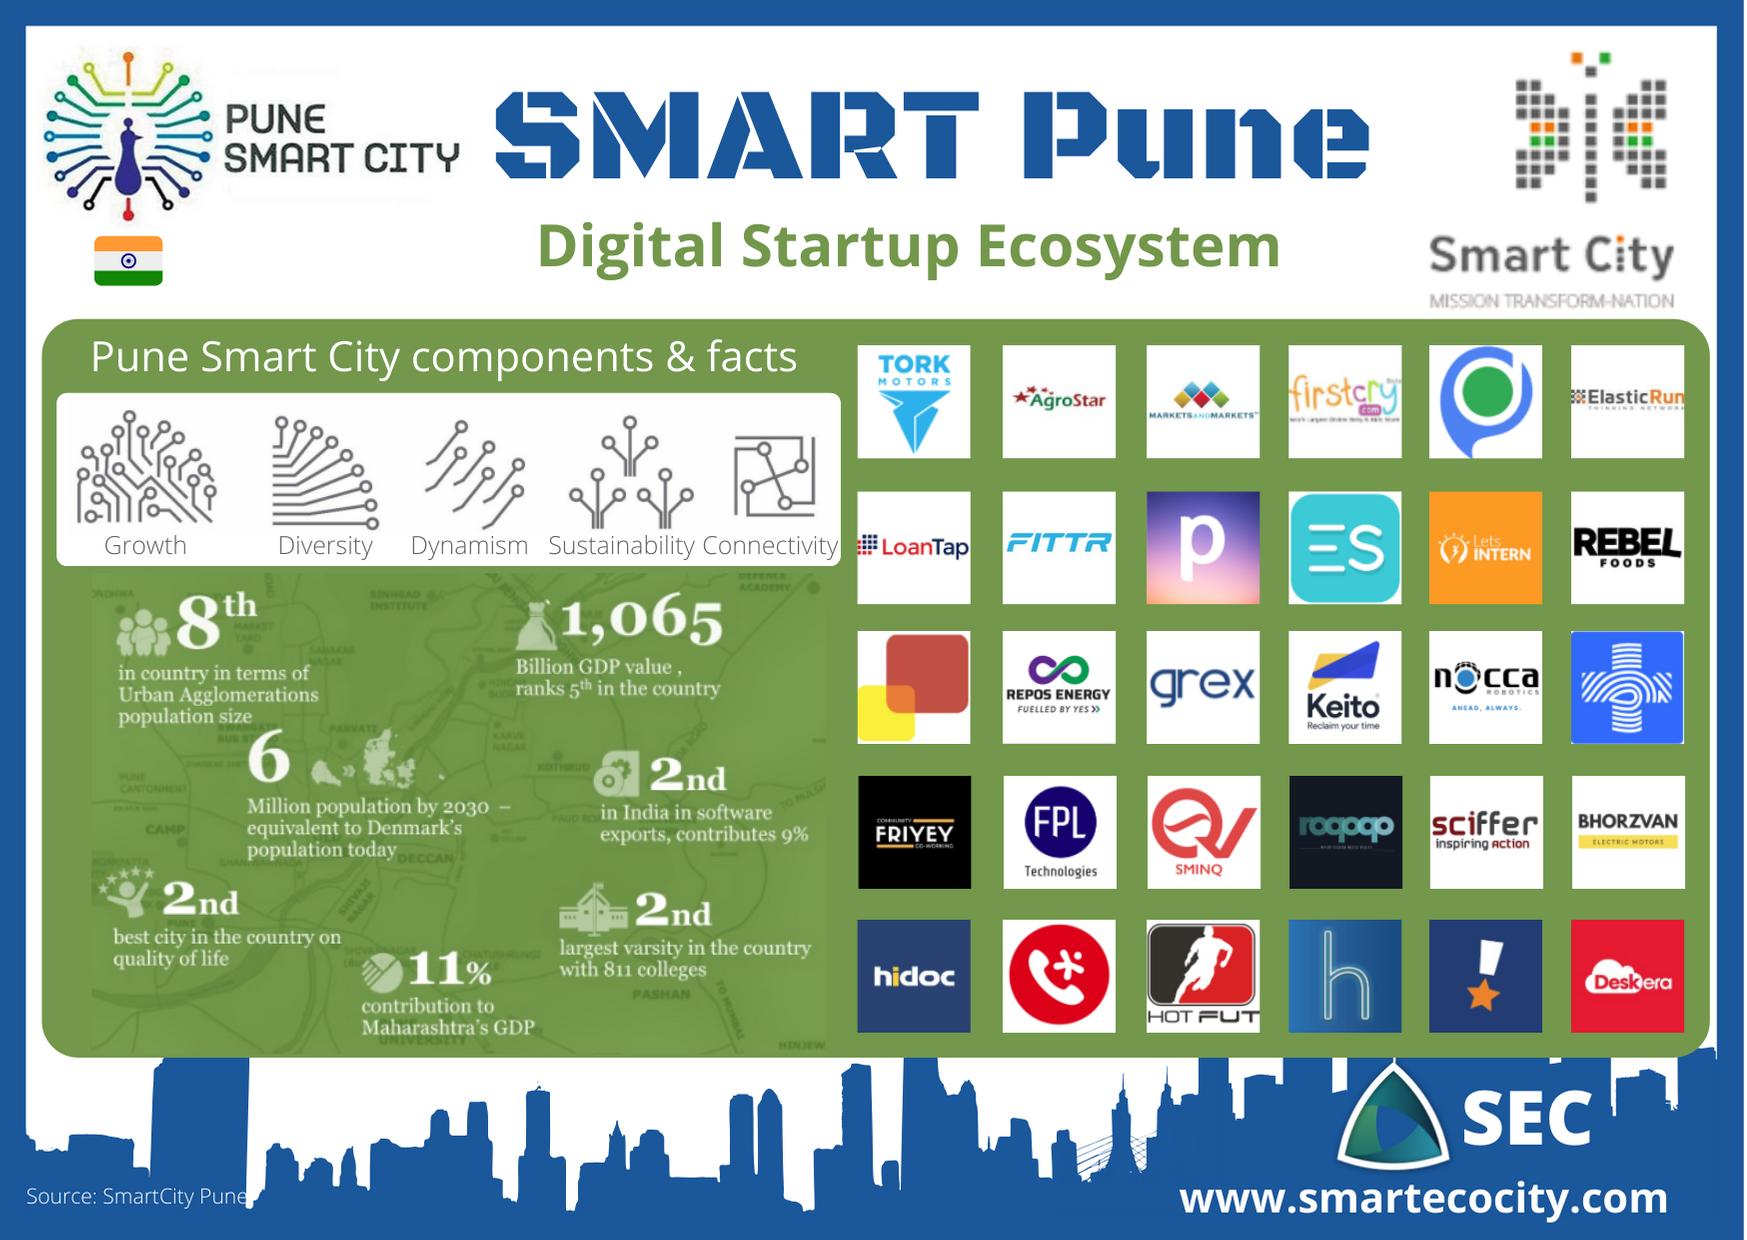 Pune Smart City